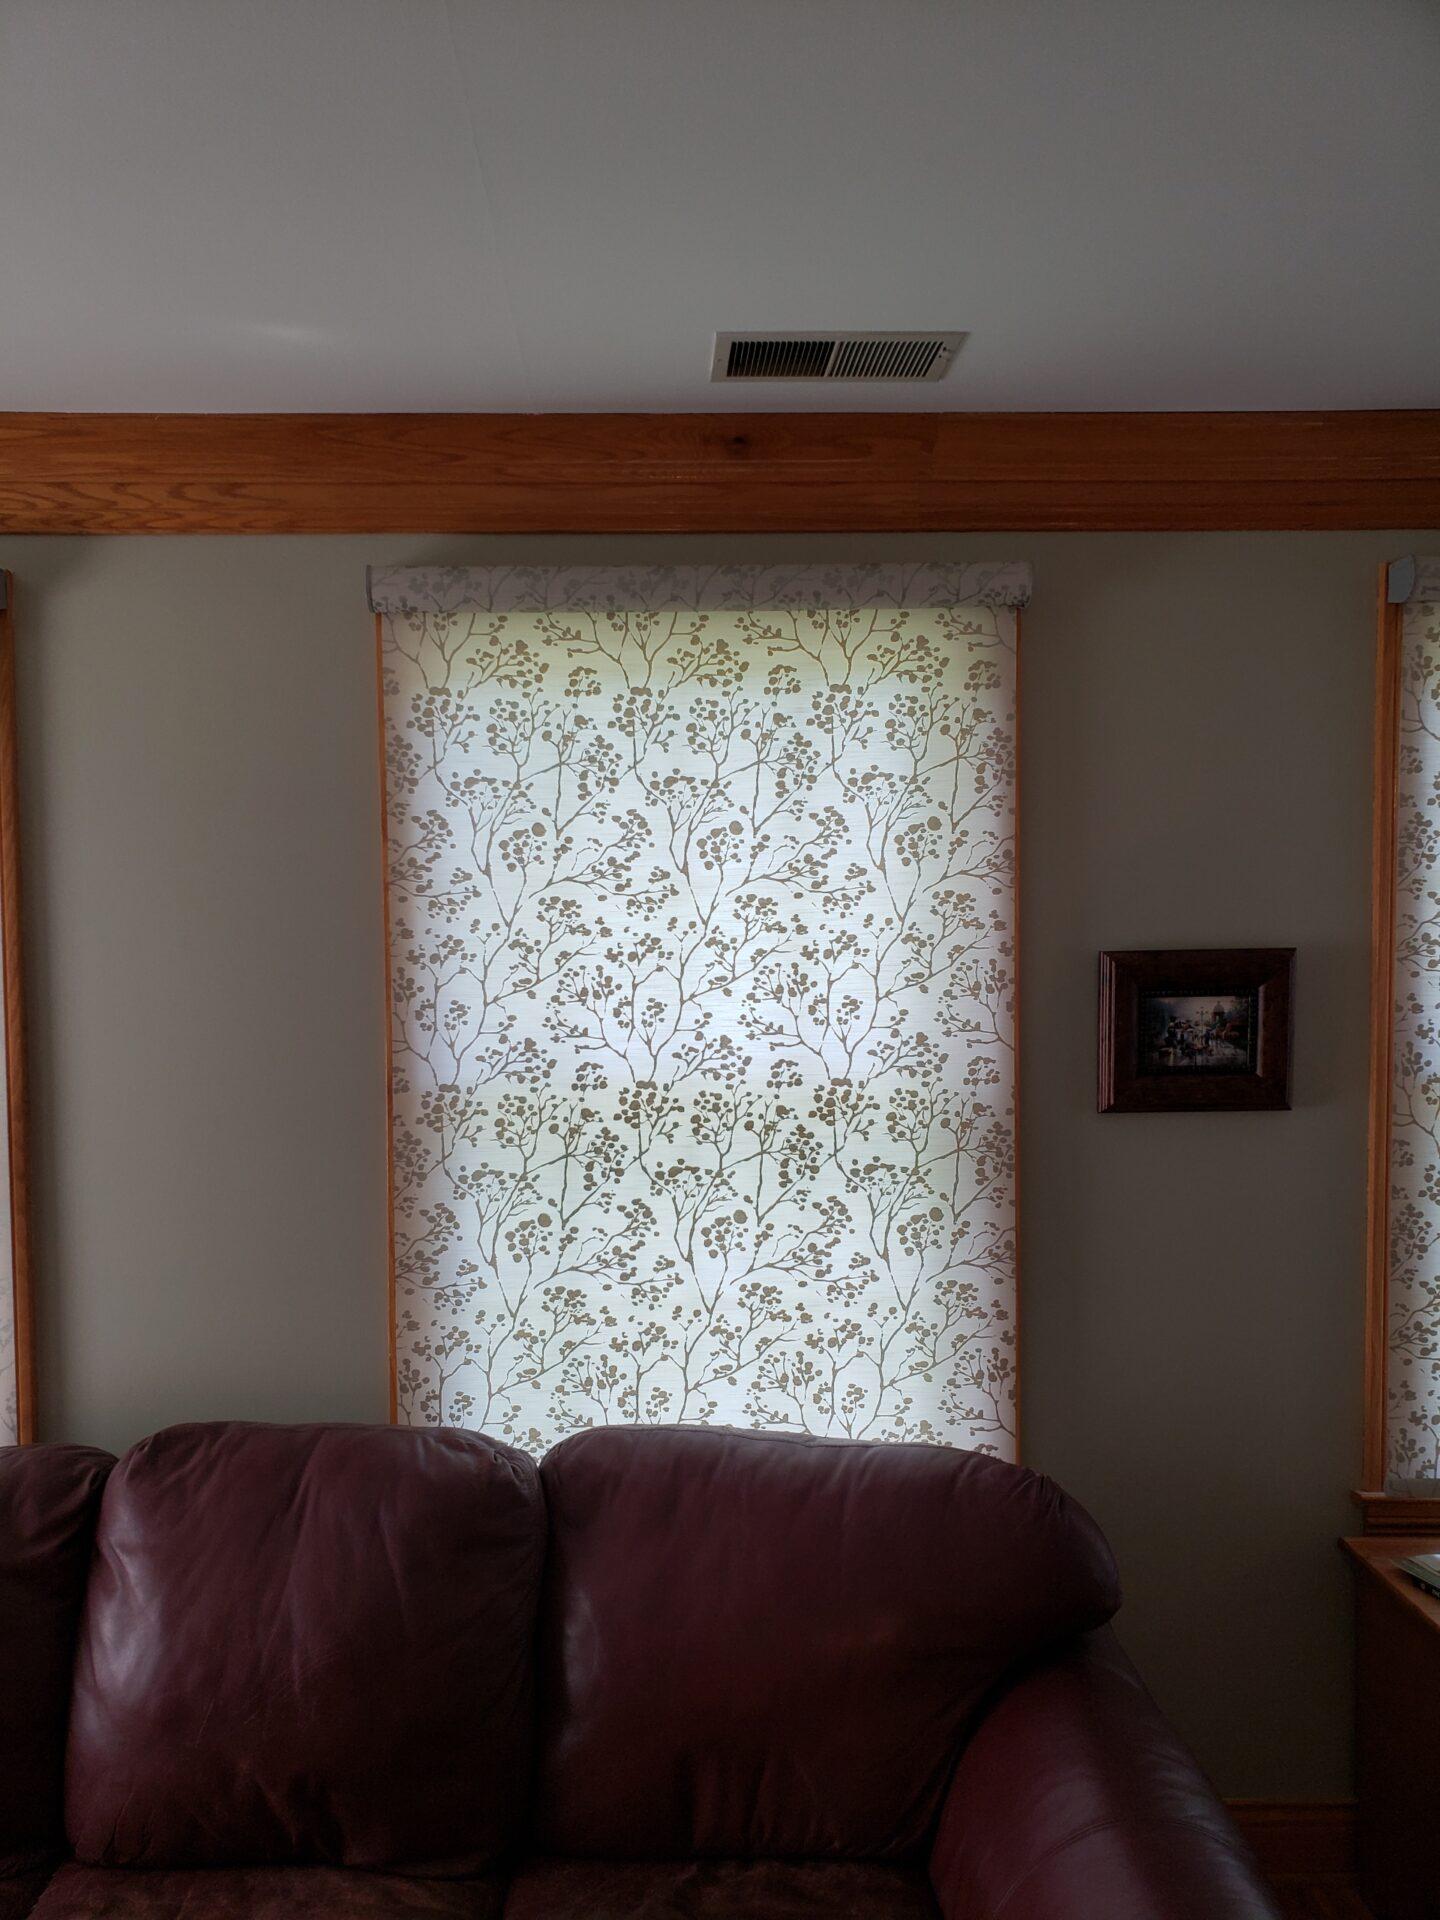 Roller Shades - Interior Window Plantation Shutters - Custom, Motorized Window Treatments, Blind Repair, Custom Blinds | Nashville, TN